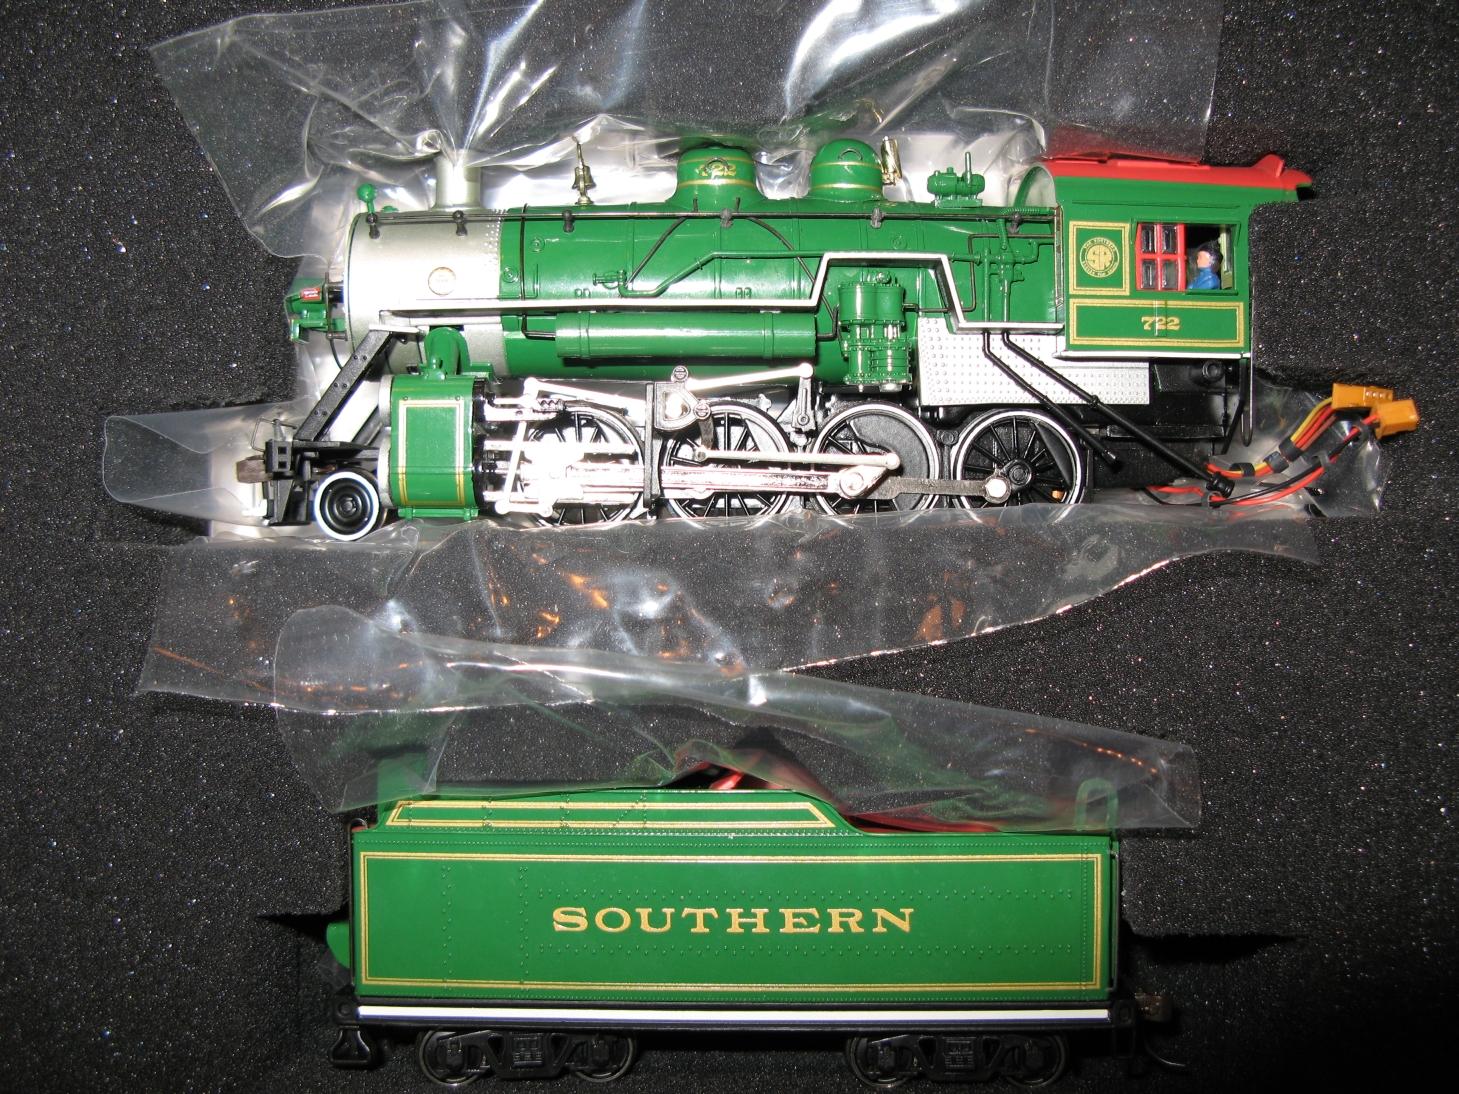 722 Southern Steam Engine